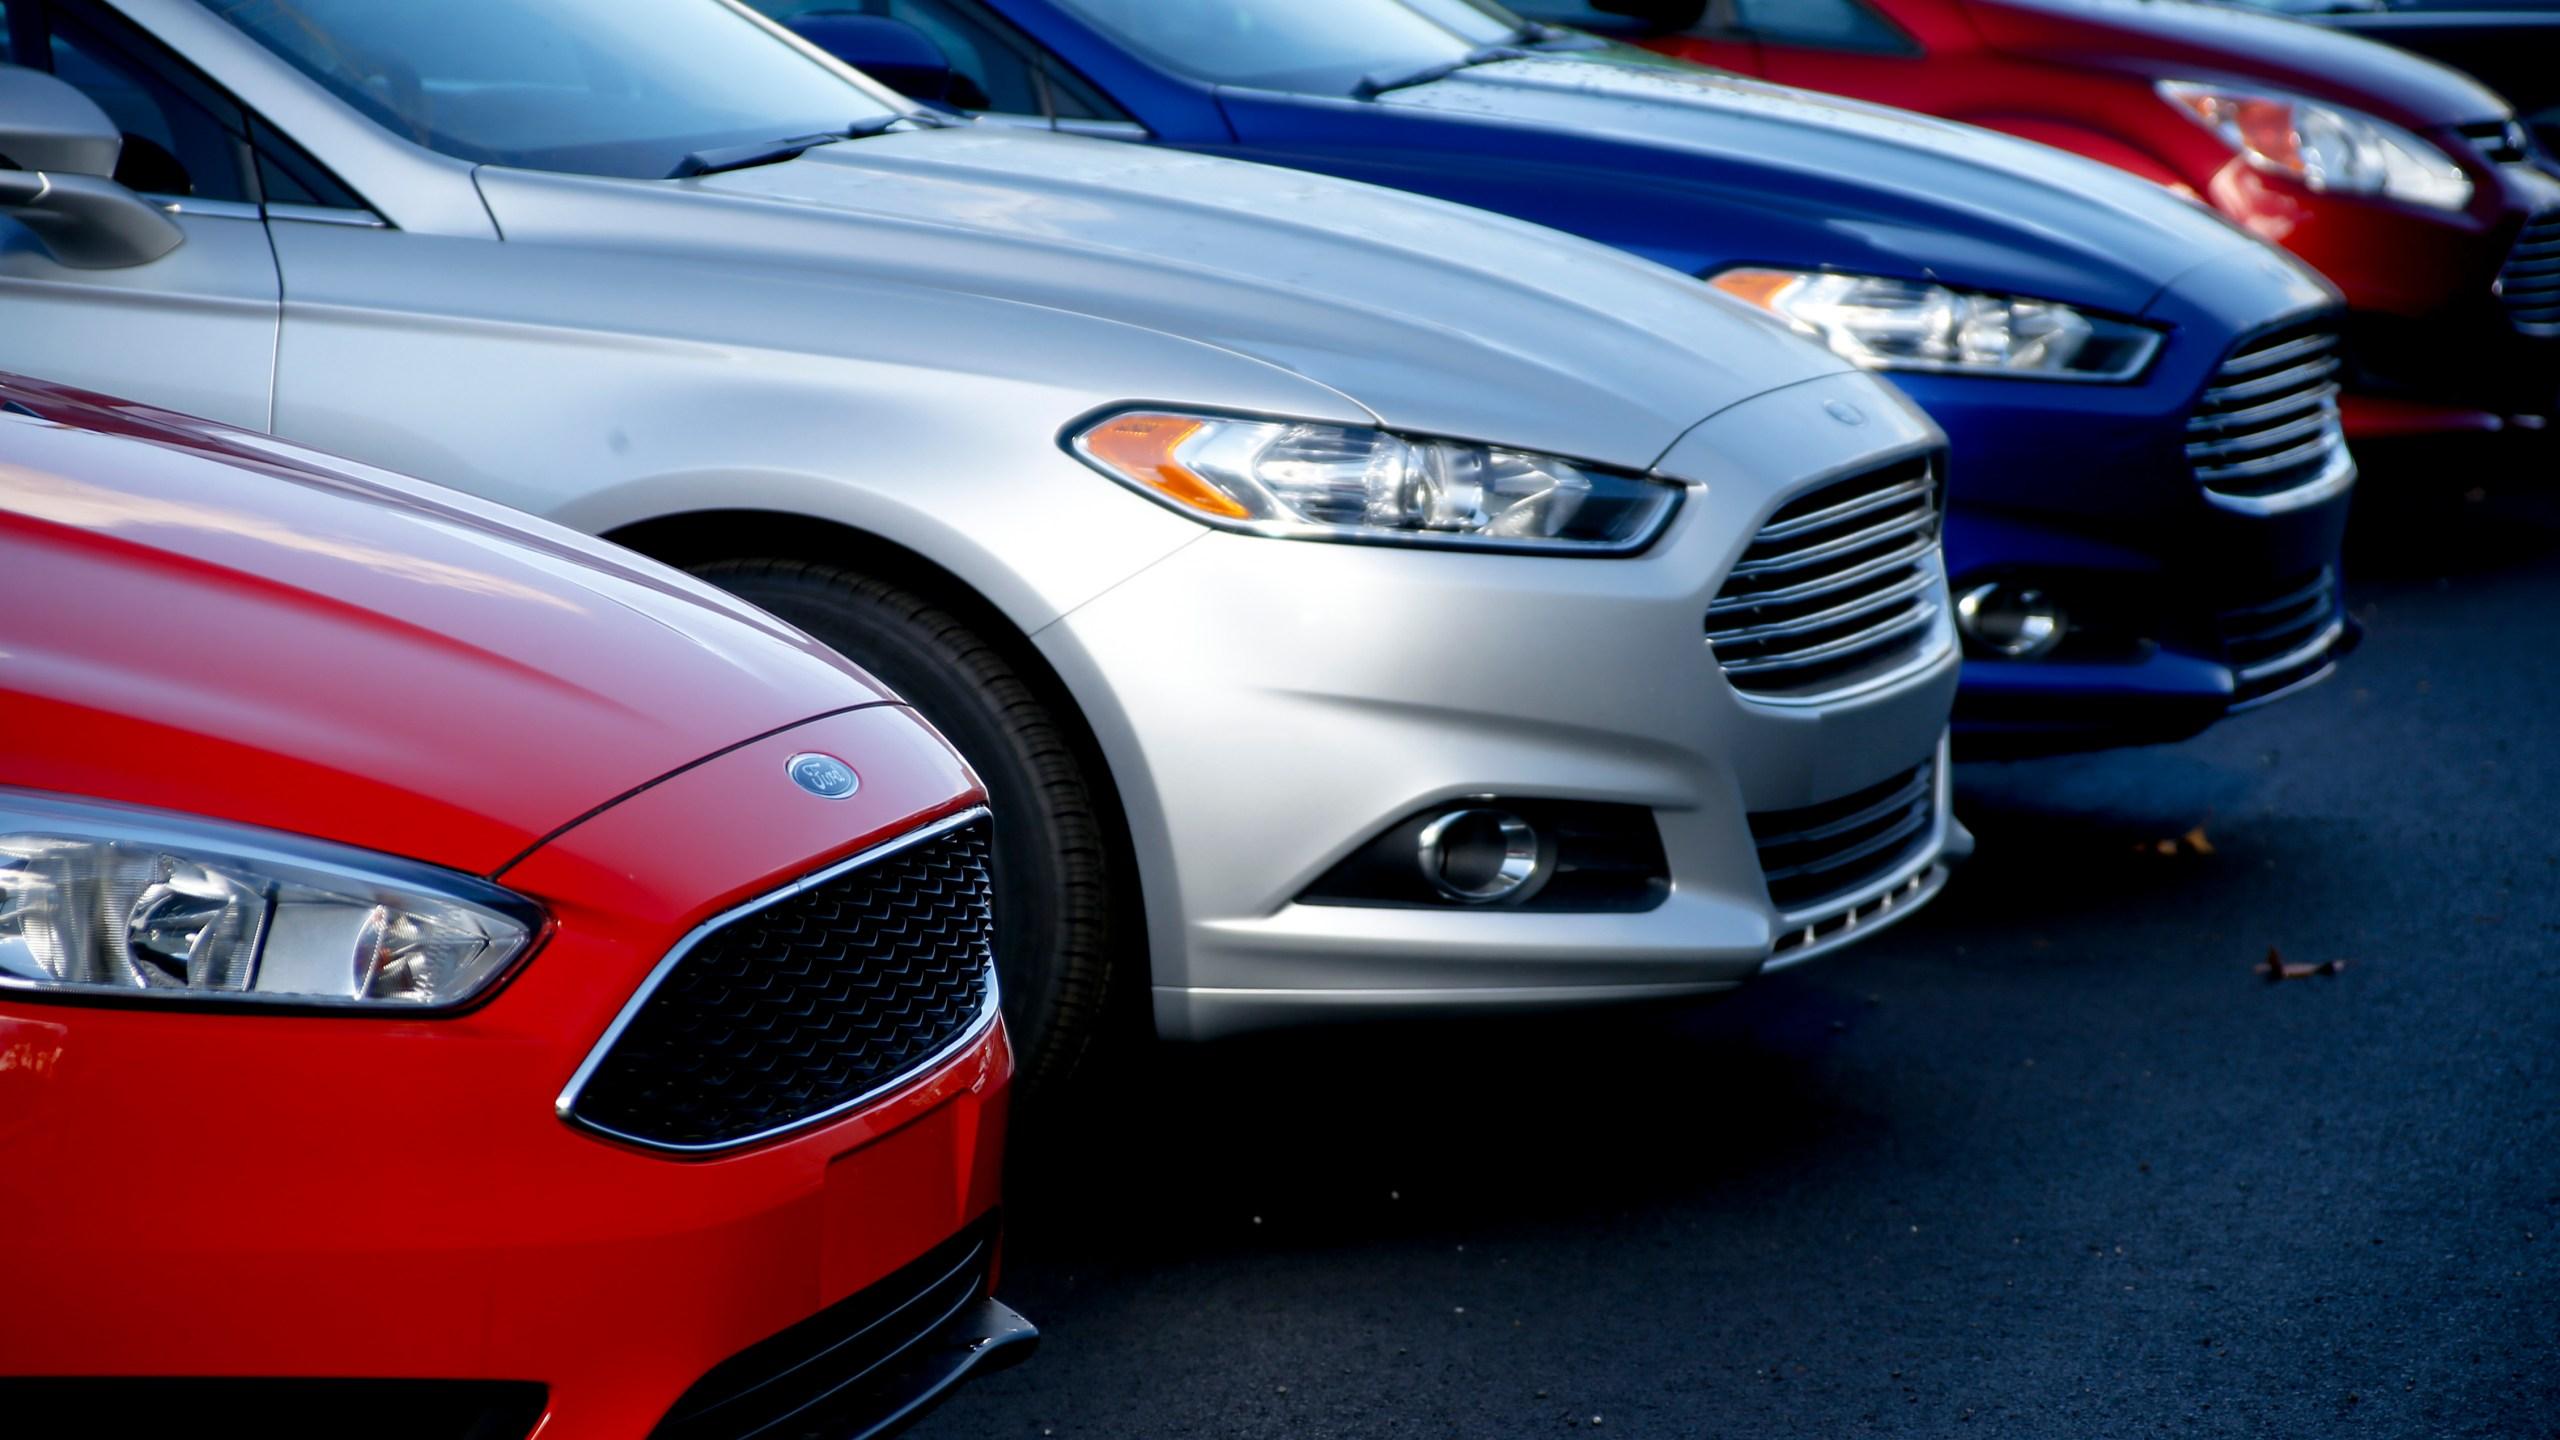 Ford_Recall_17343-159532.jpg27643906